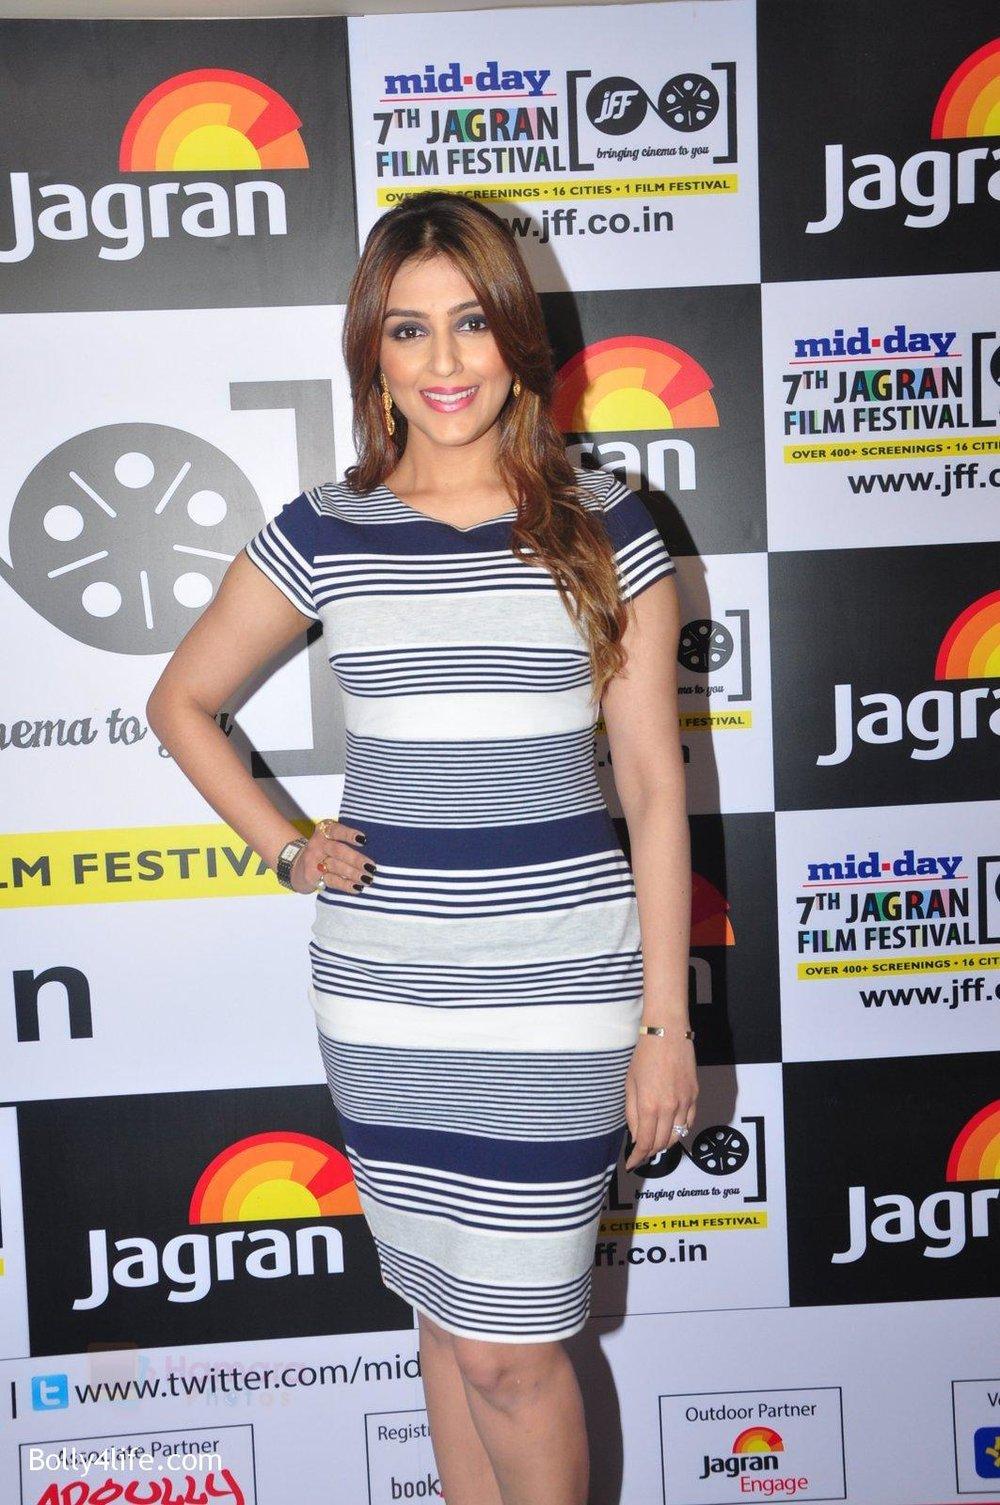 Aarti-Chhabria-at-Jagran-Film-festival-on-29th-Sept-2016-39.jpg